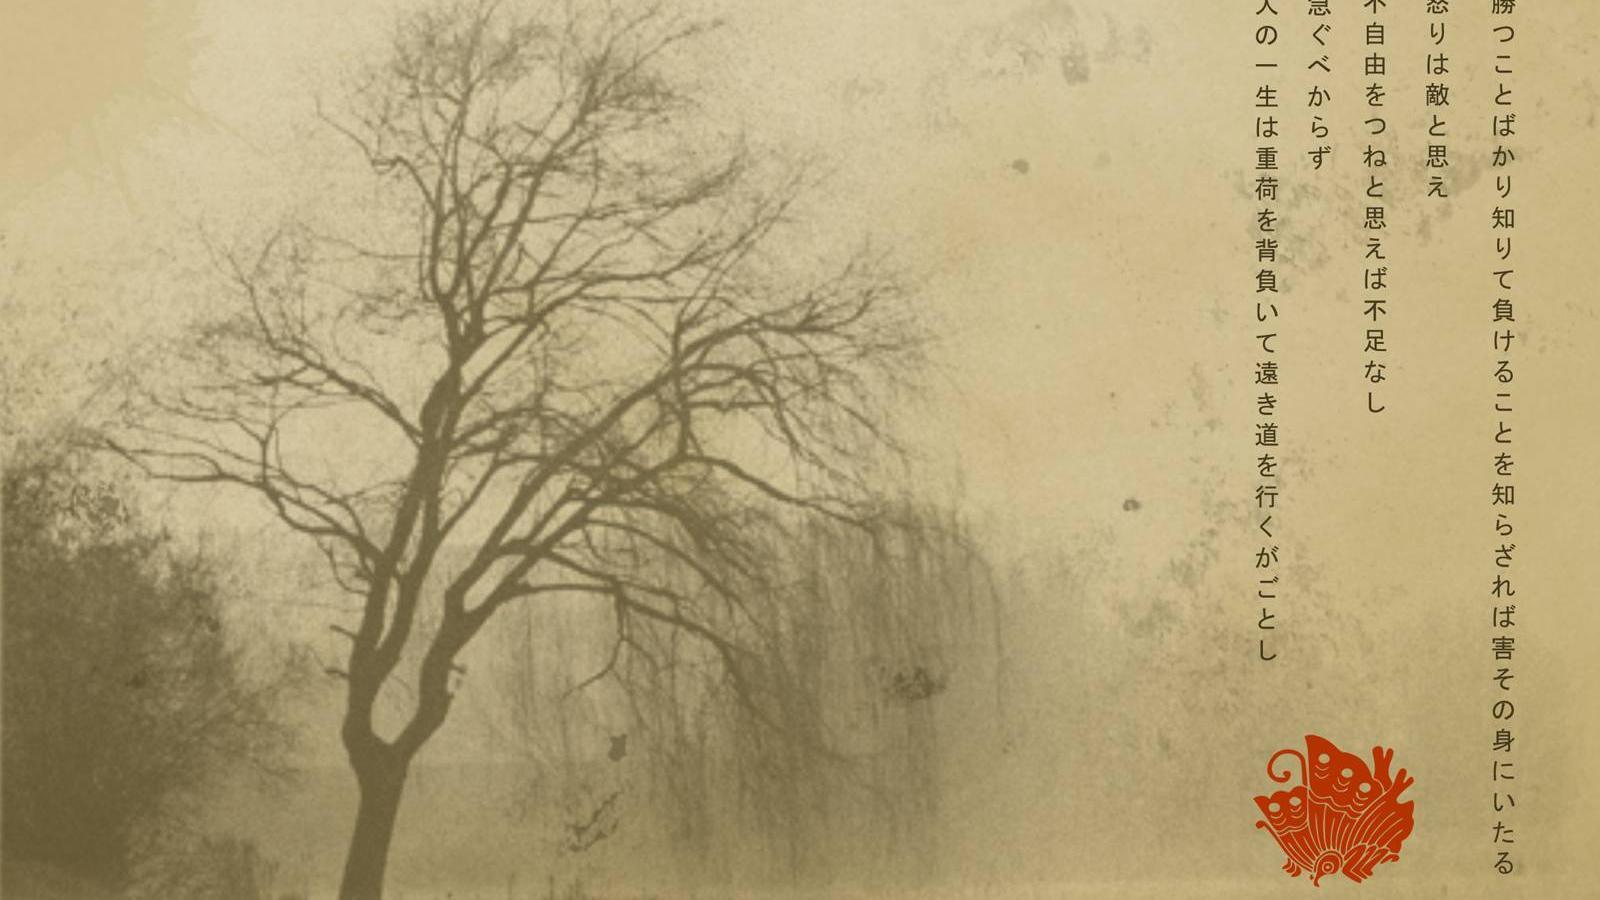 Dark Textured Backgrounds wallpaper 1920x1080 32738 1600x900